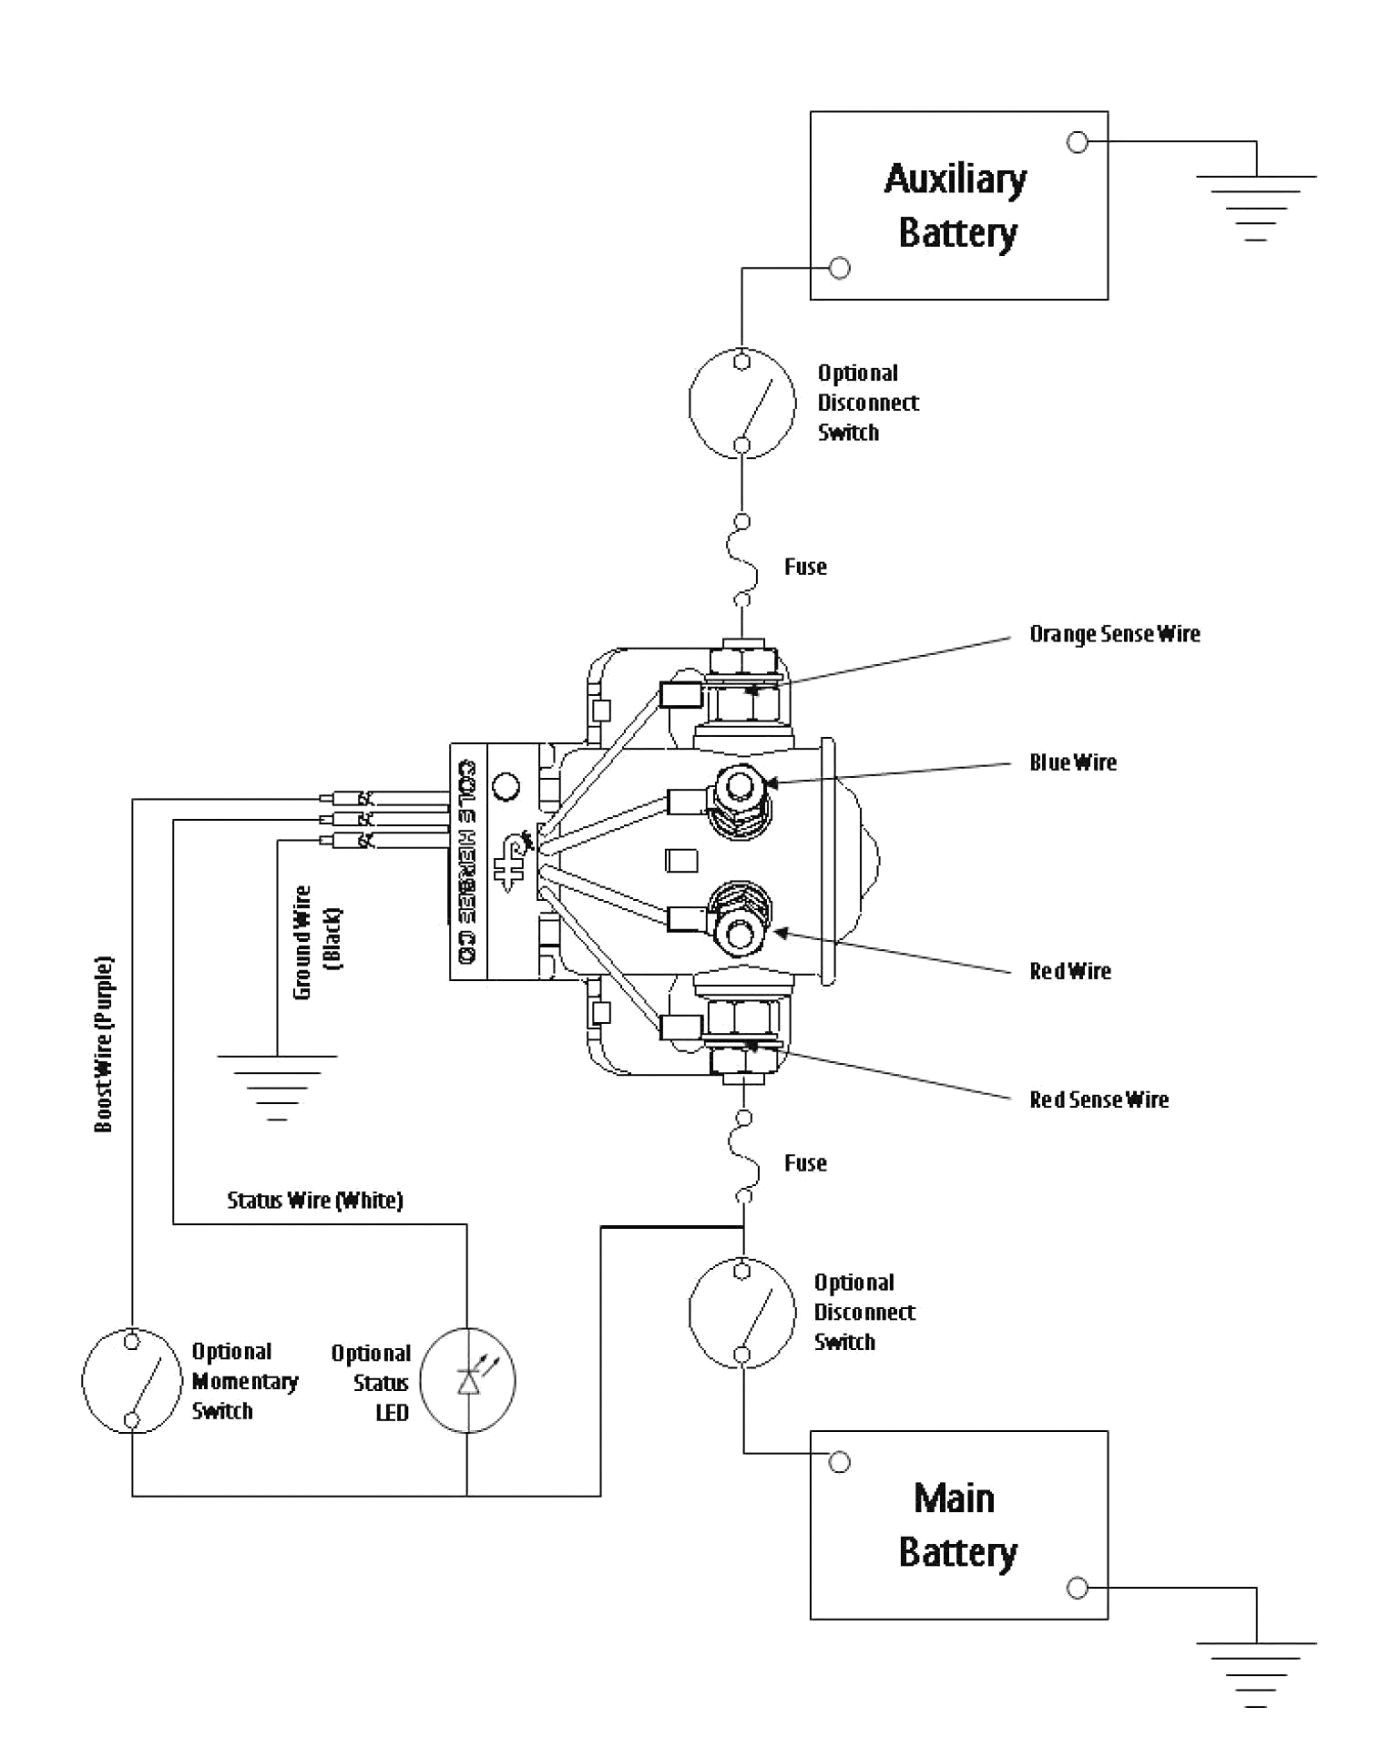 st85 solenoid wiring diagram wiring diagram compilation st85 solenoid wiring diagram